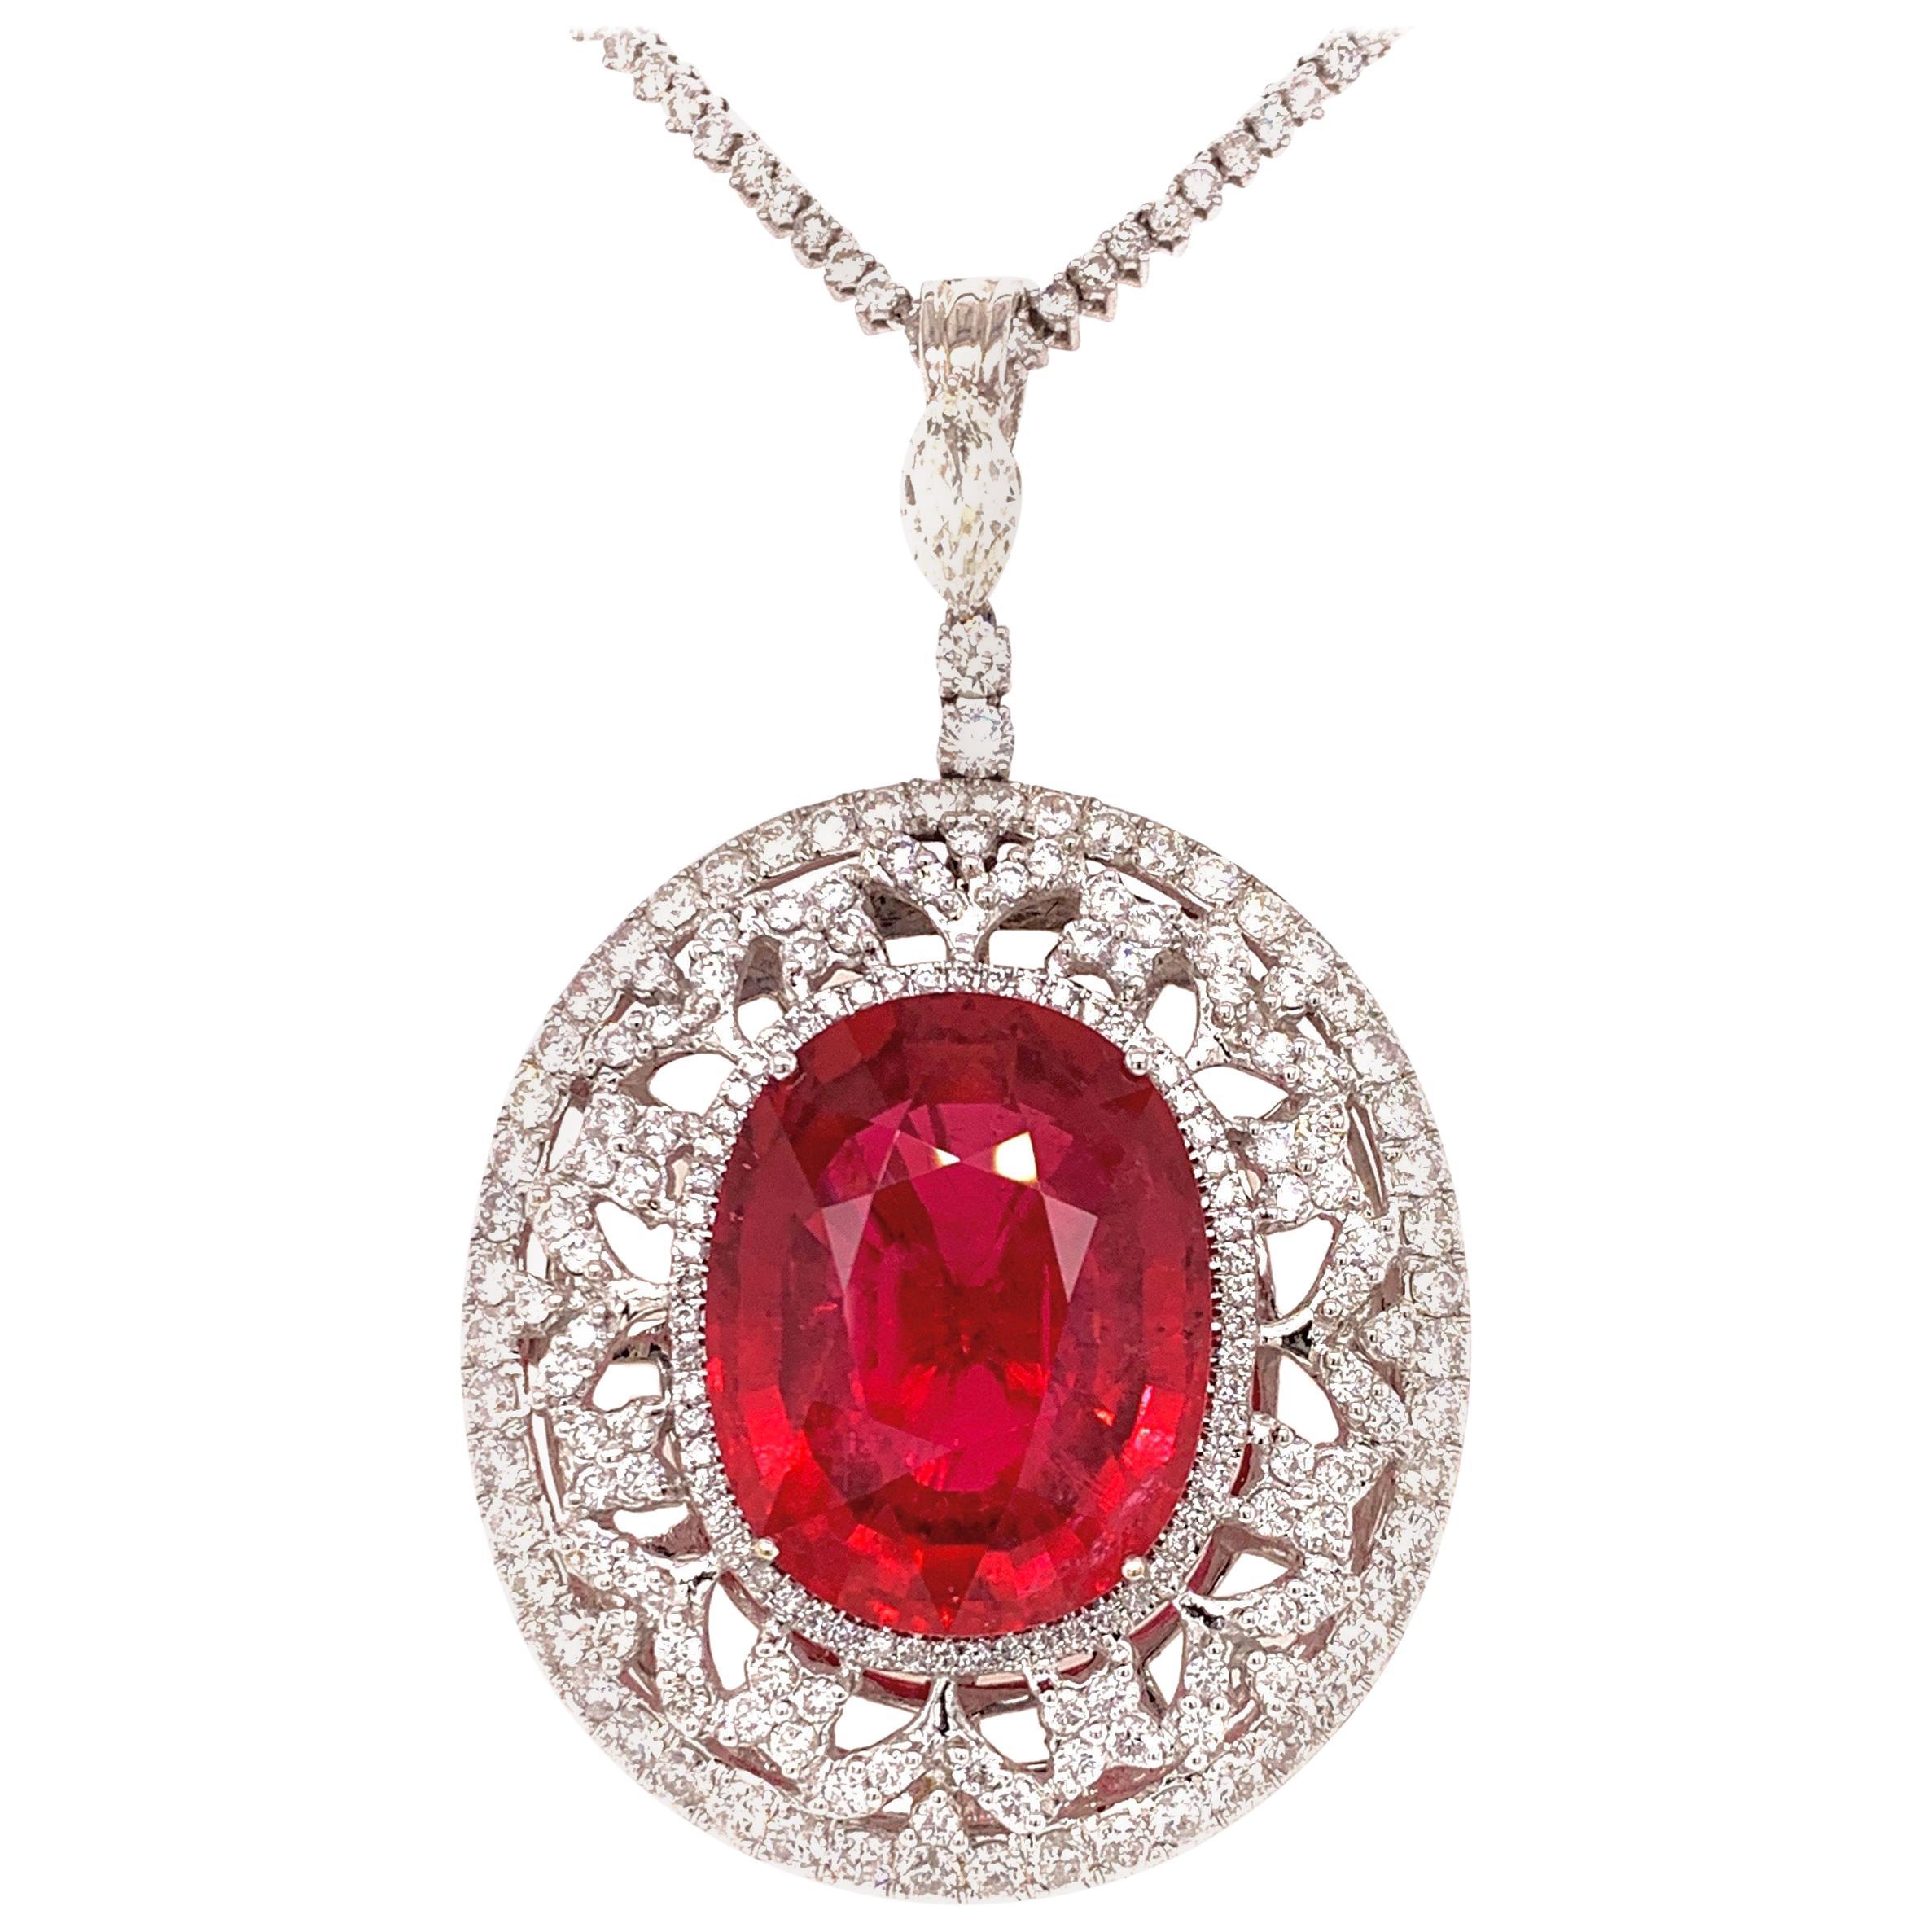 "37.56 Carat Tourmaline ""Rubellite"" Diamond Pendant Necklace"